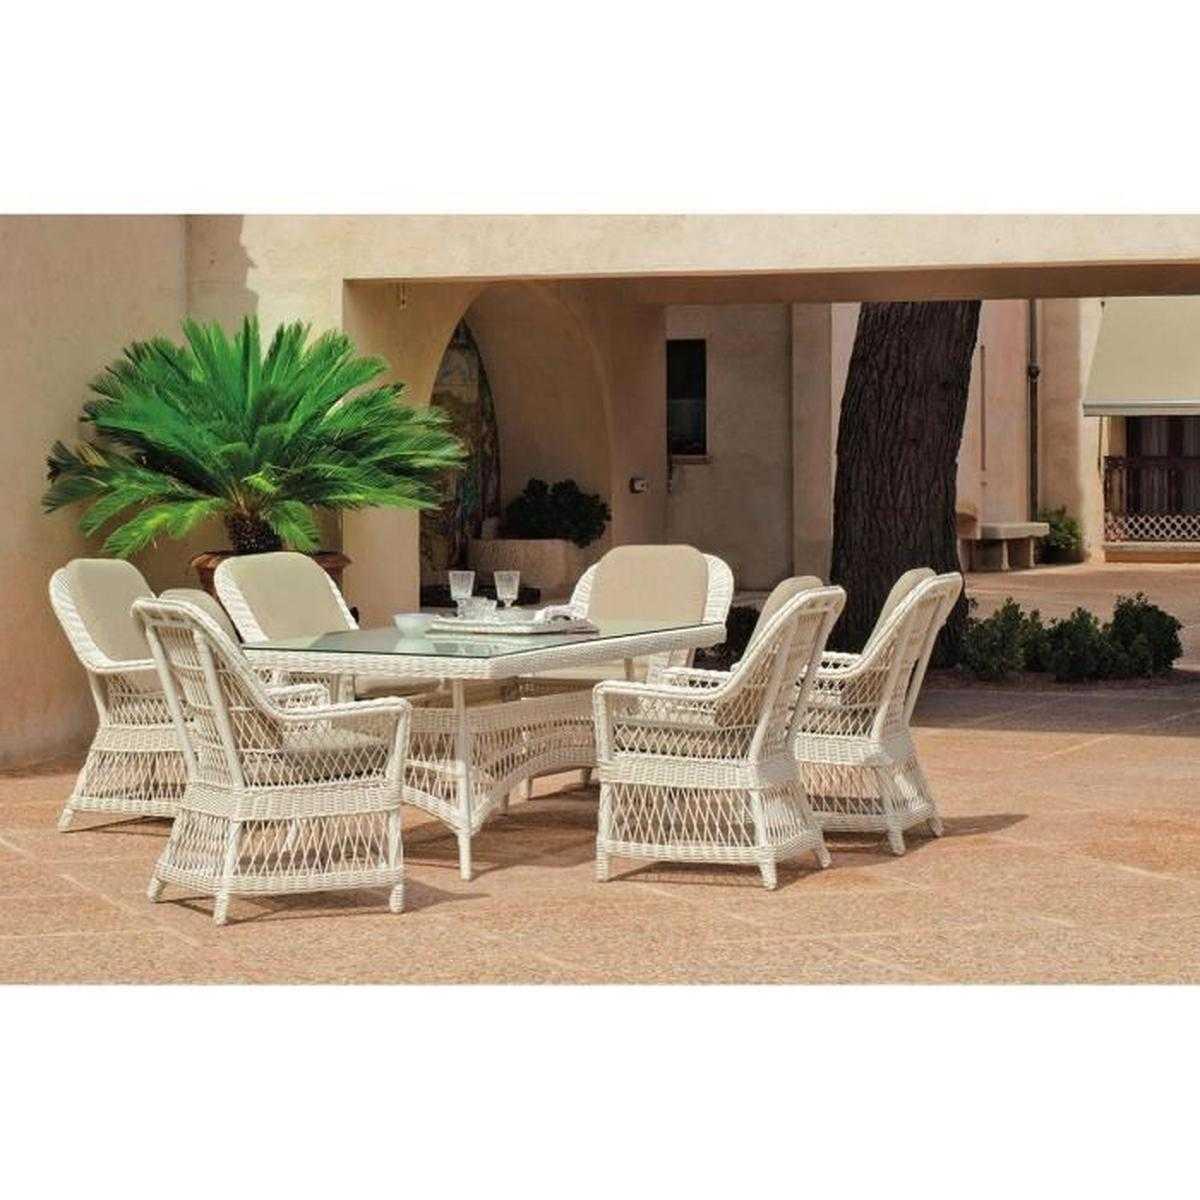 Salle A Manger De Jardin En Resine Tressee 33 inspirant chaise de jardin en résine tressée | salon jardin